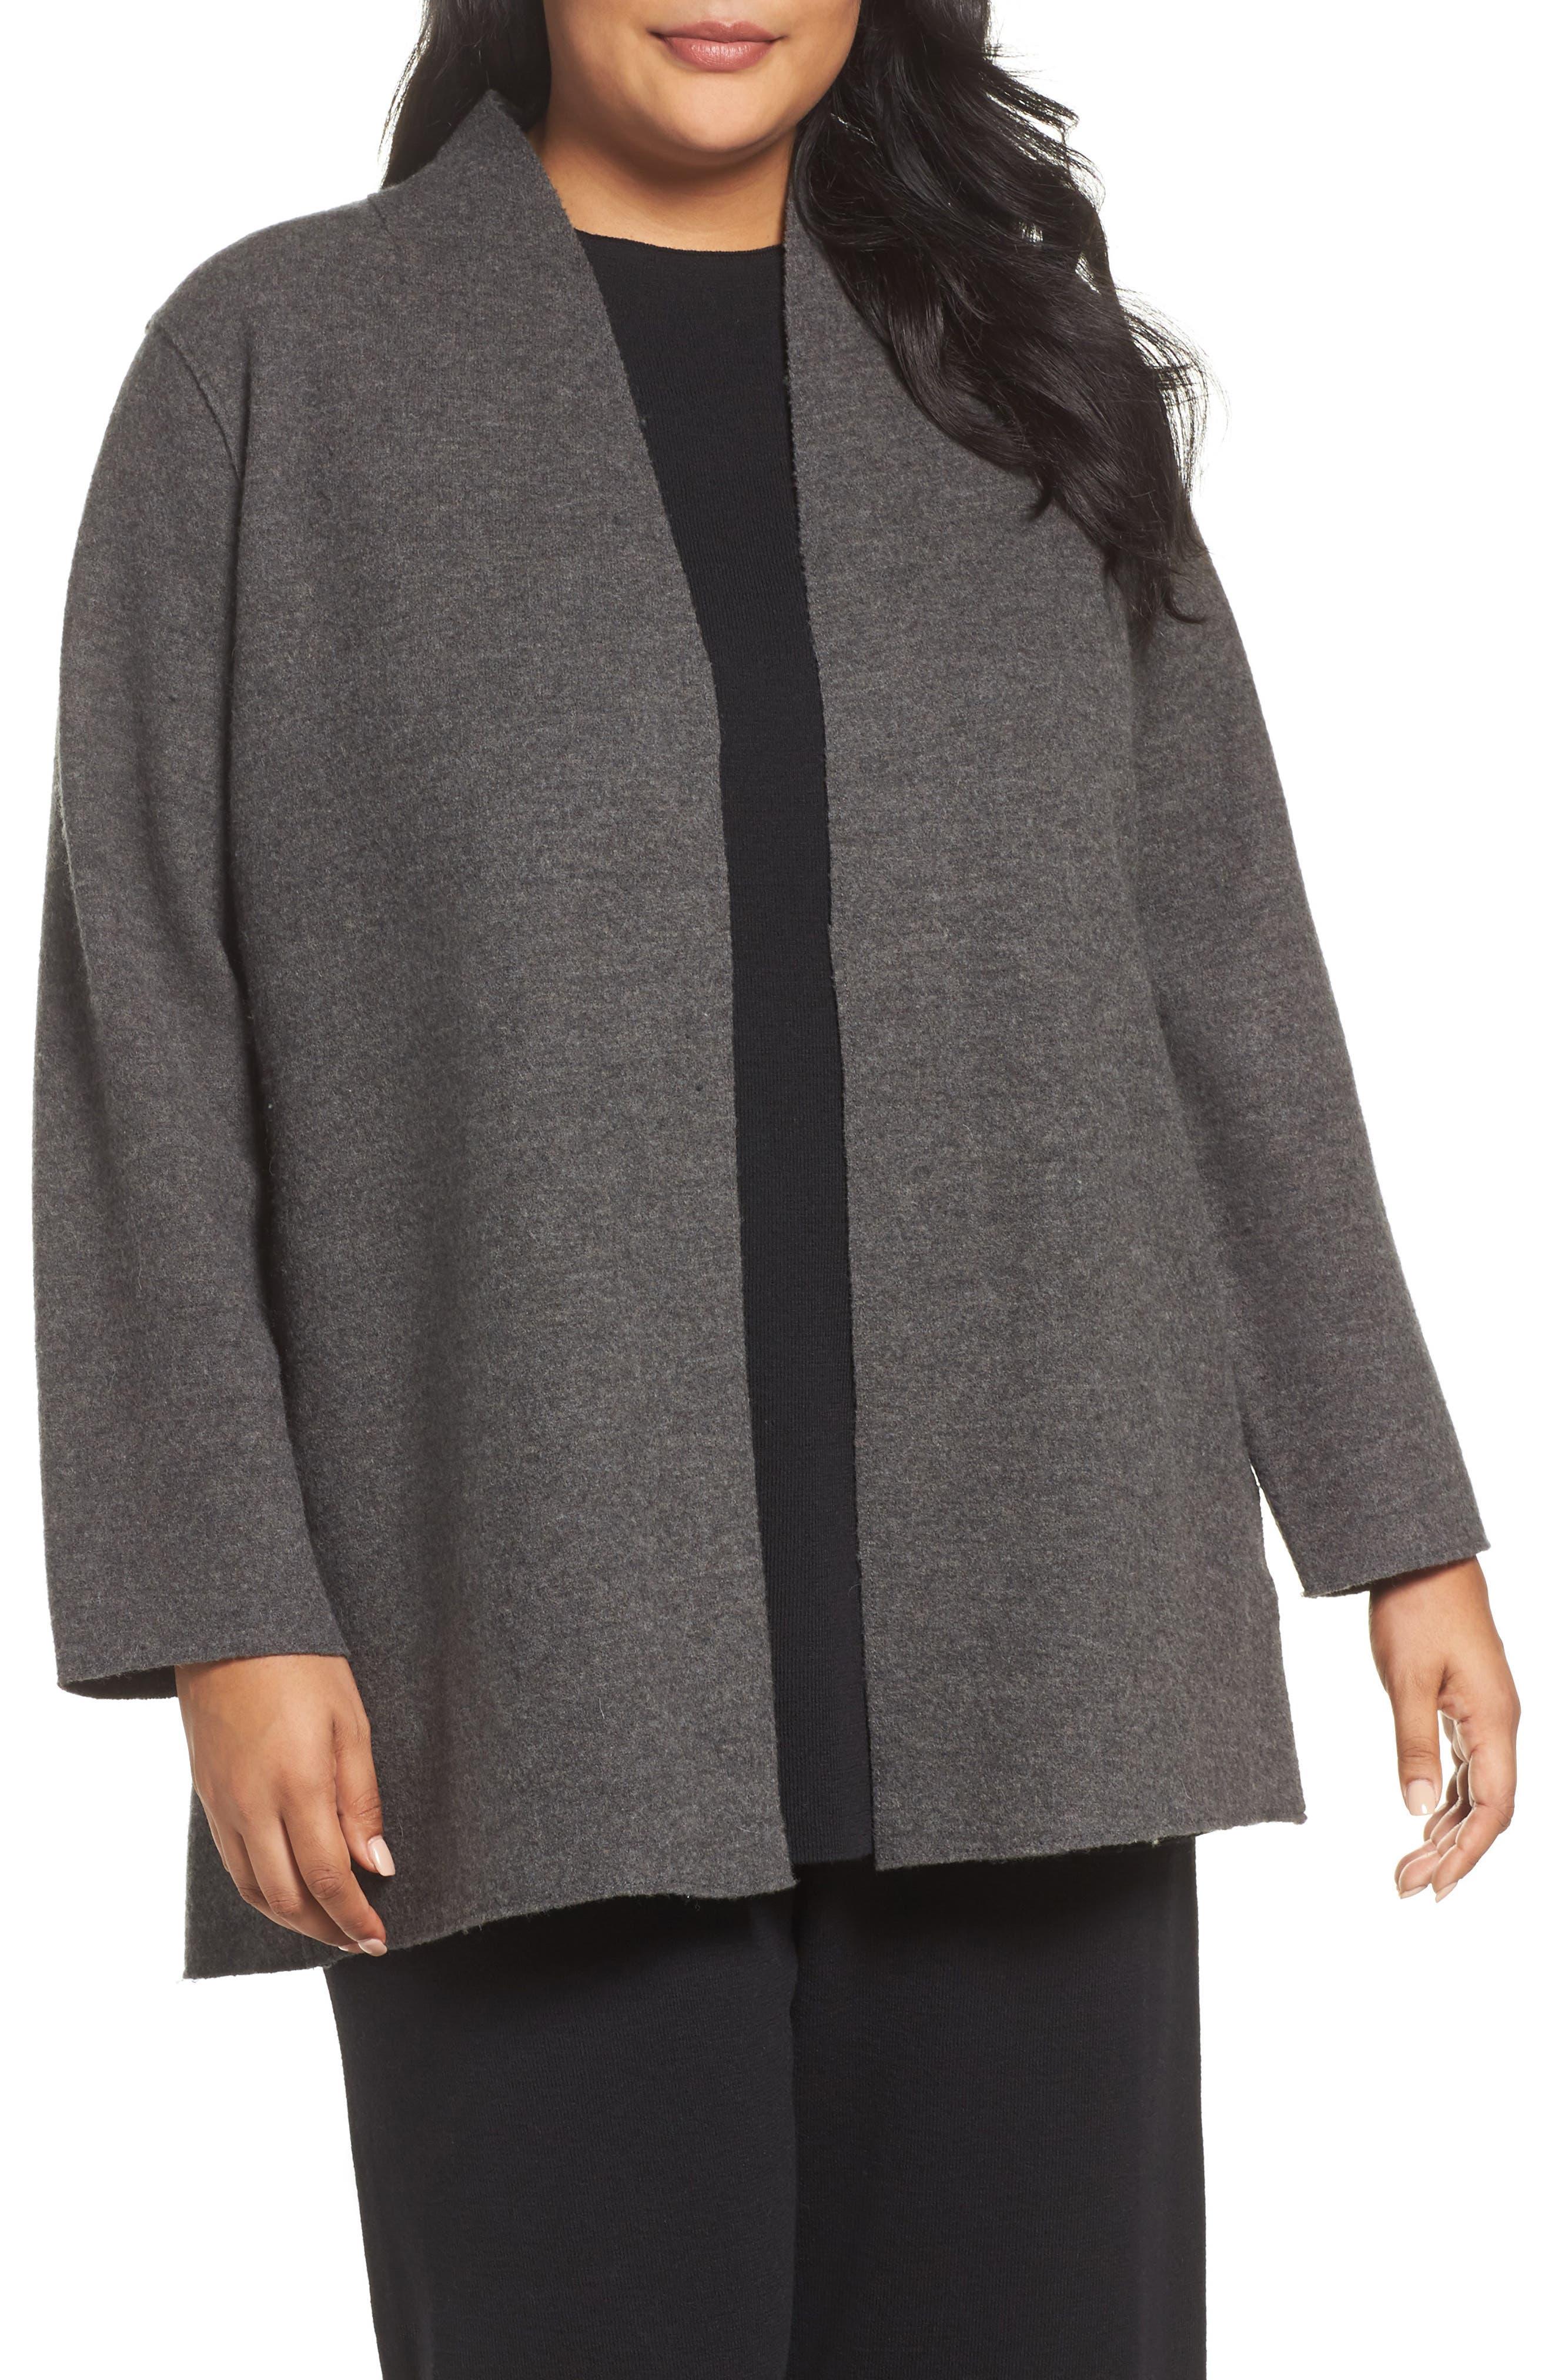 Boiled Wool Jacket,                         Main,                         color,